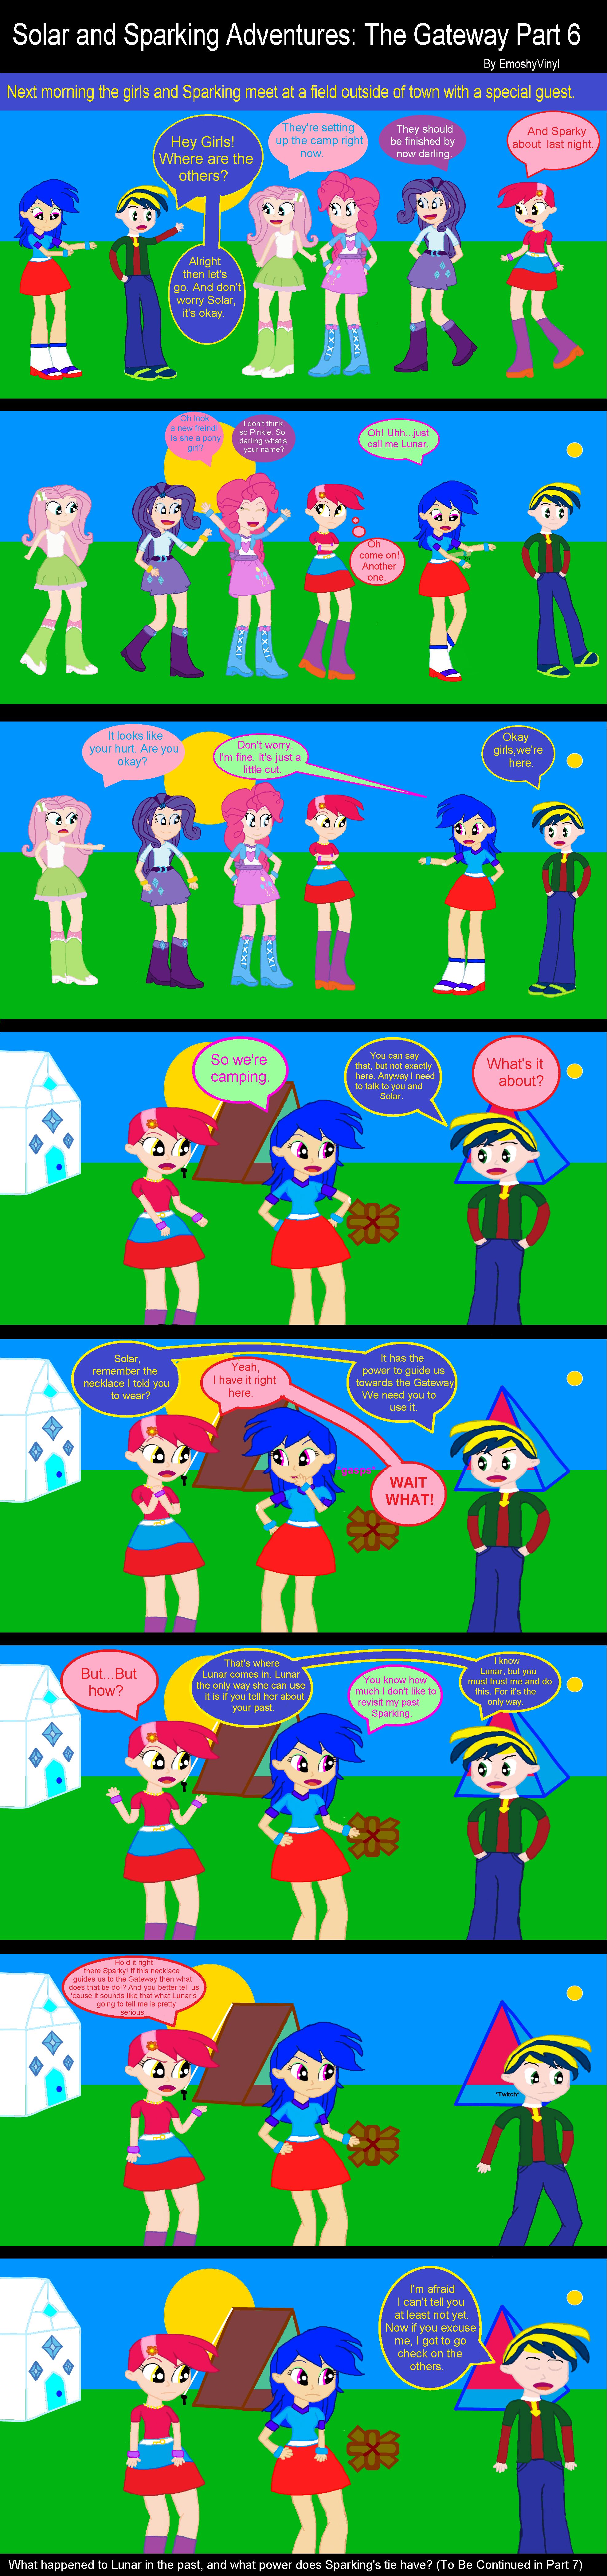 Solar and Sparking Adventures: The Gateway Part 6 by EmoshyVinyl